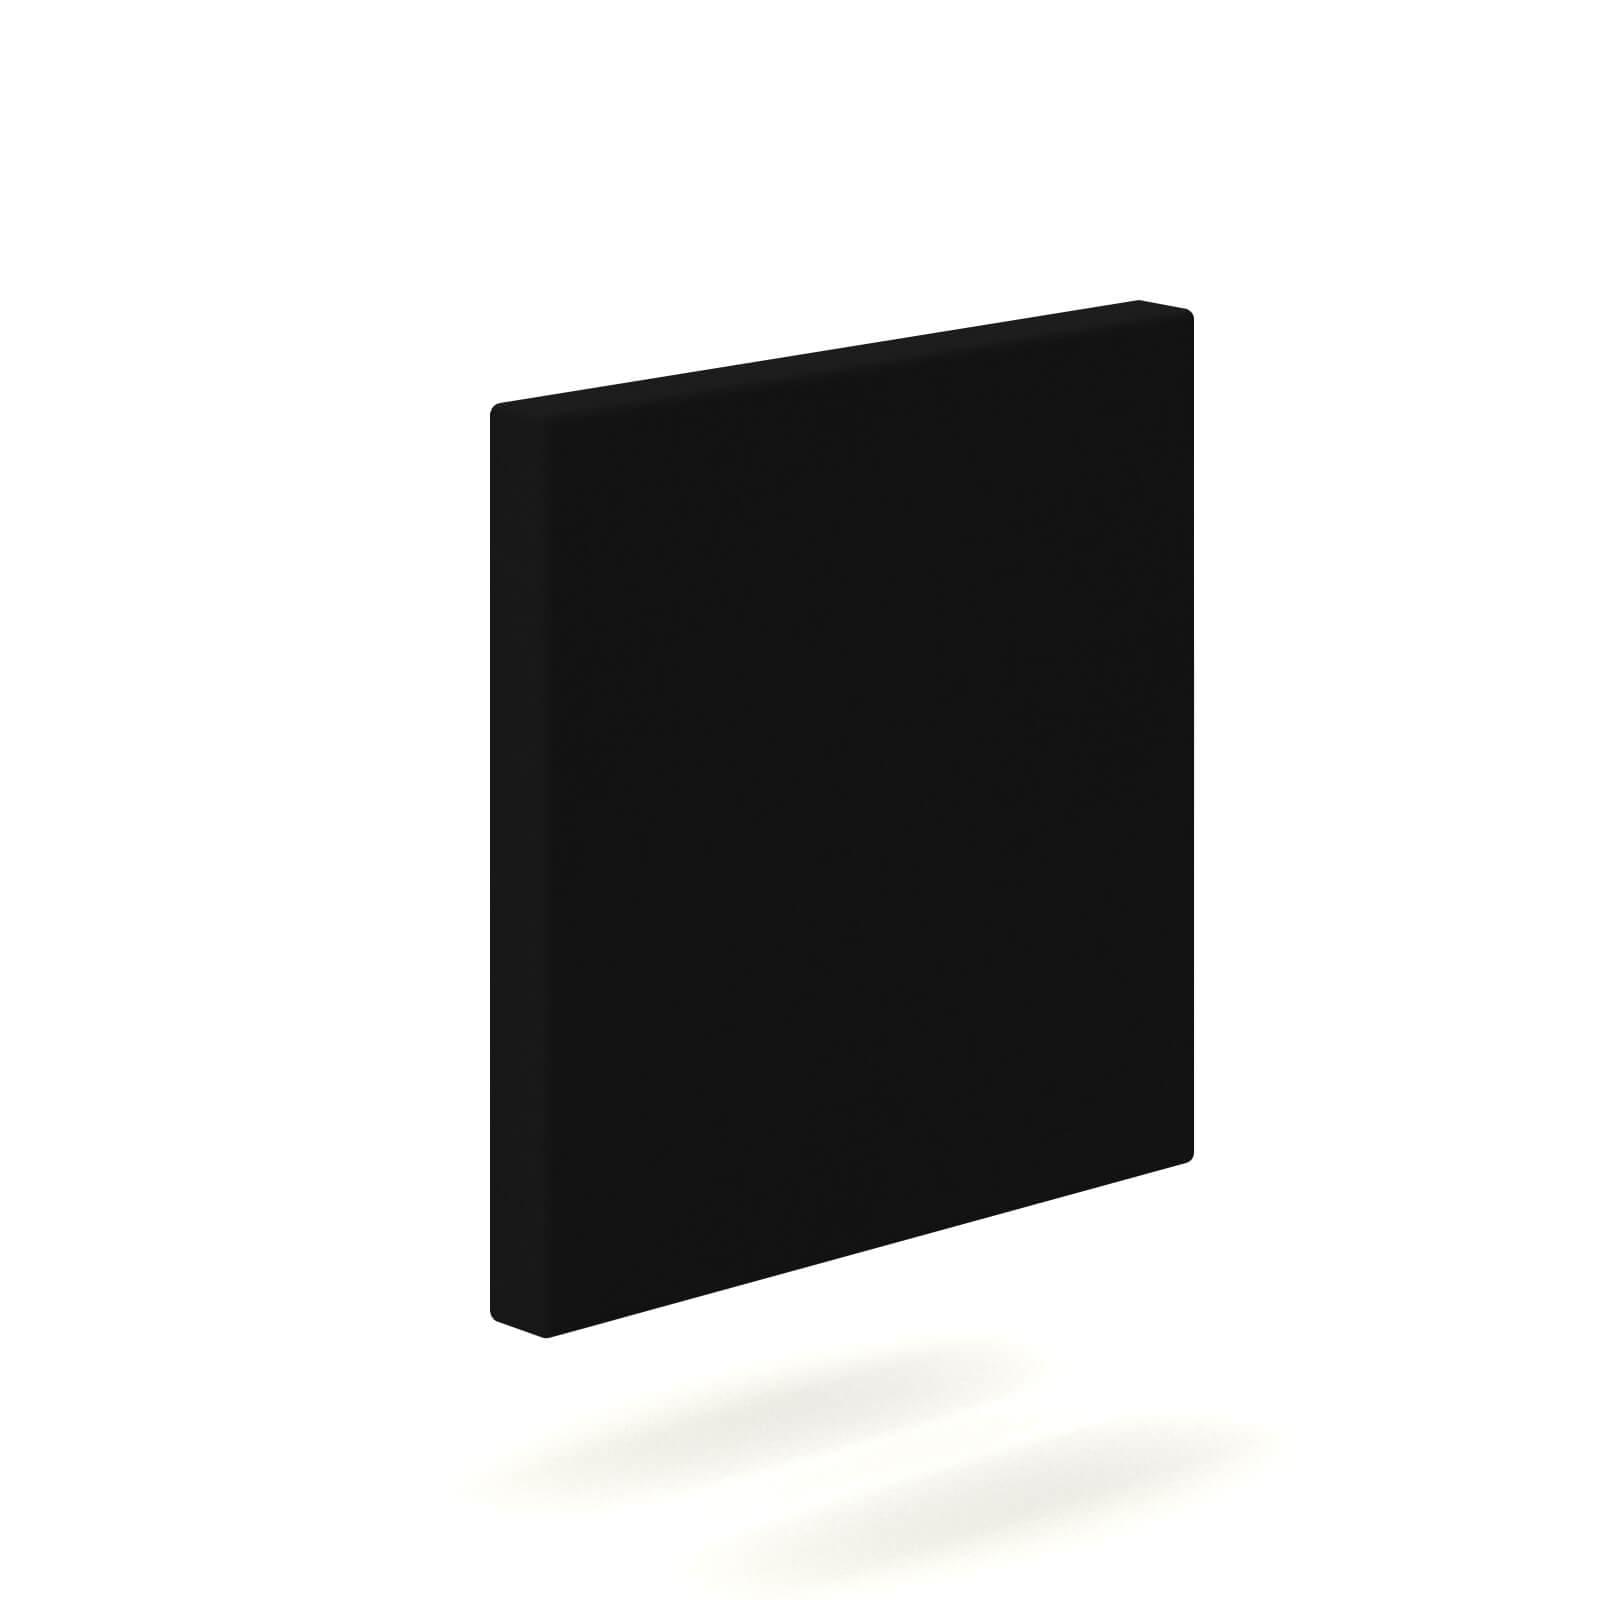 Akustik Deckensegel MODUS 400 x 400 mm horizontal Akustikplatten Paneel Filz